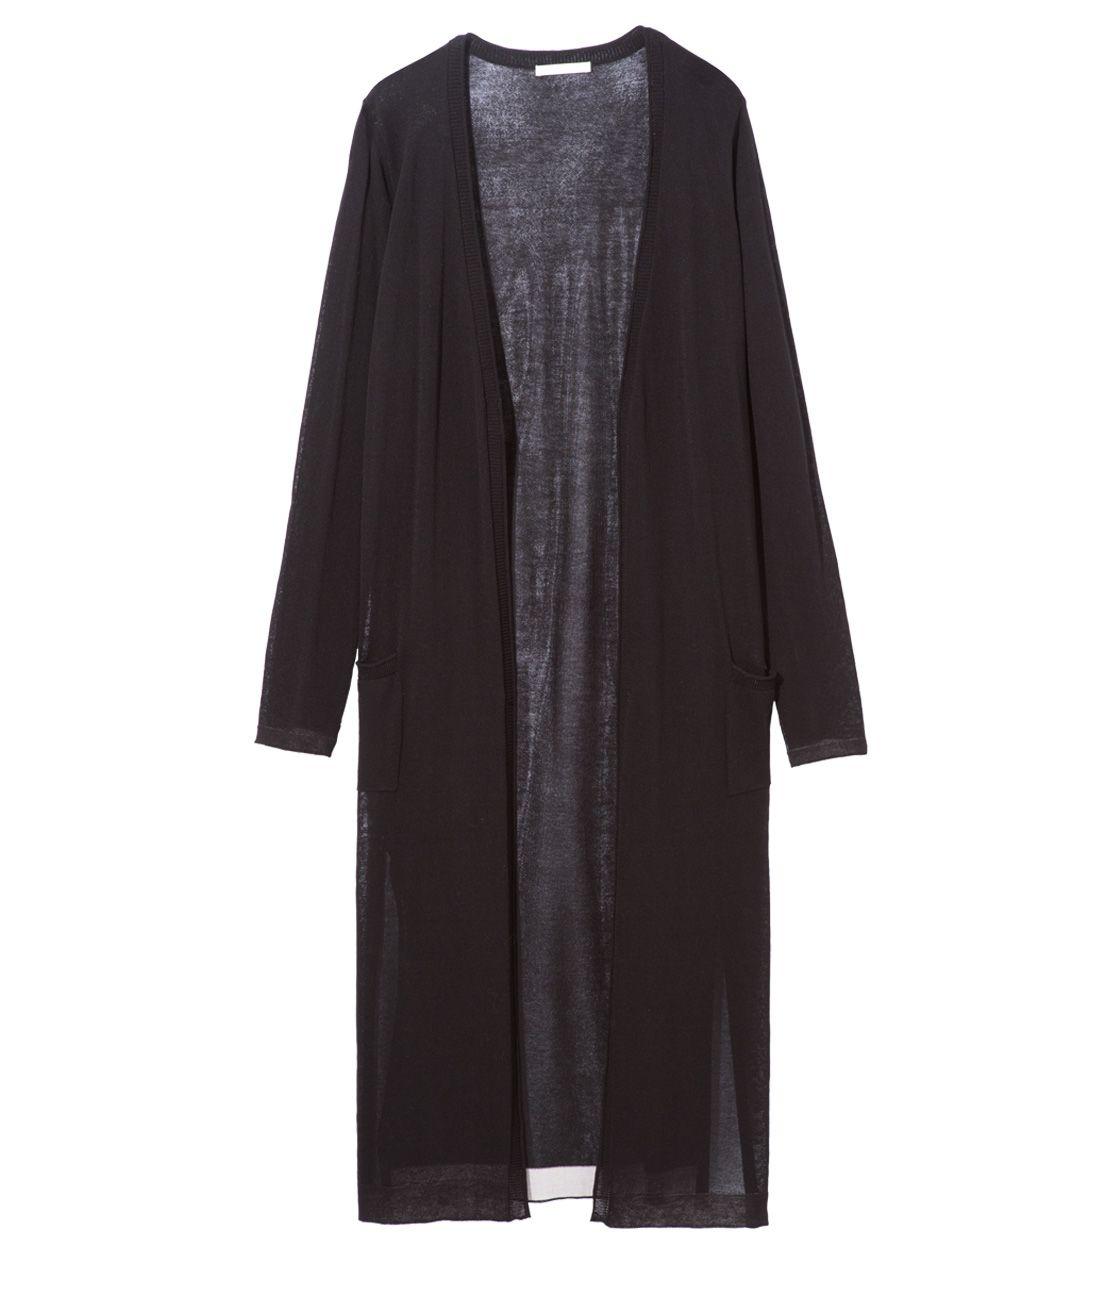 Summer knit long cardigan